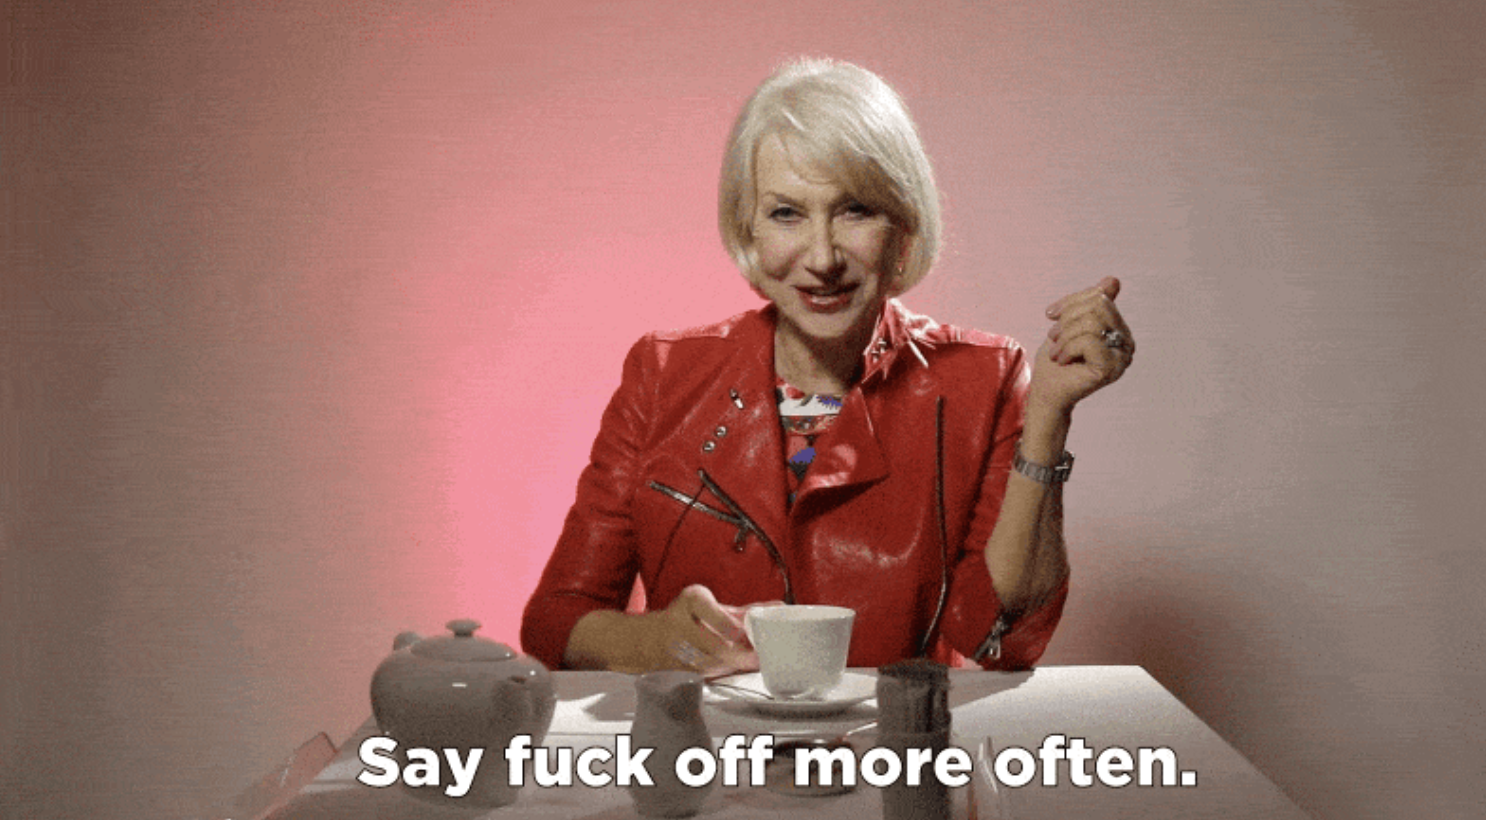 My Girl-Crush, I love Helen Mirren